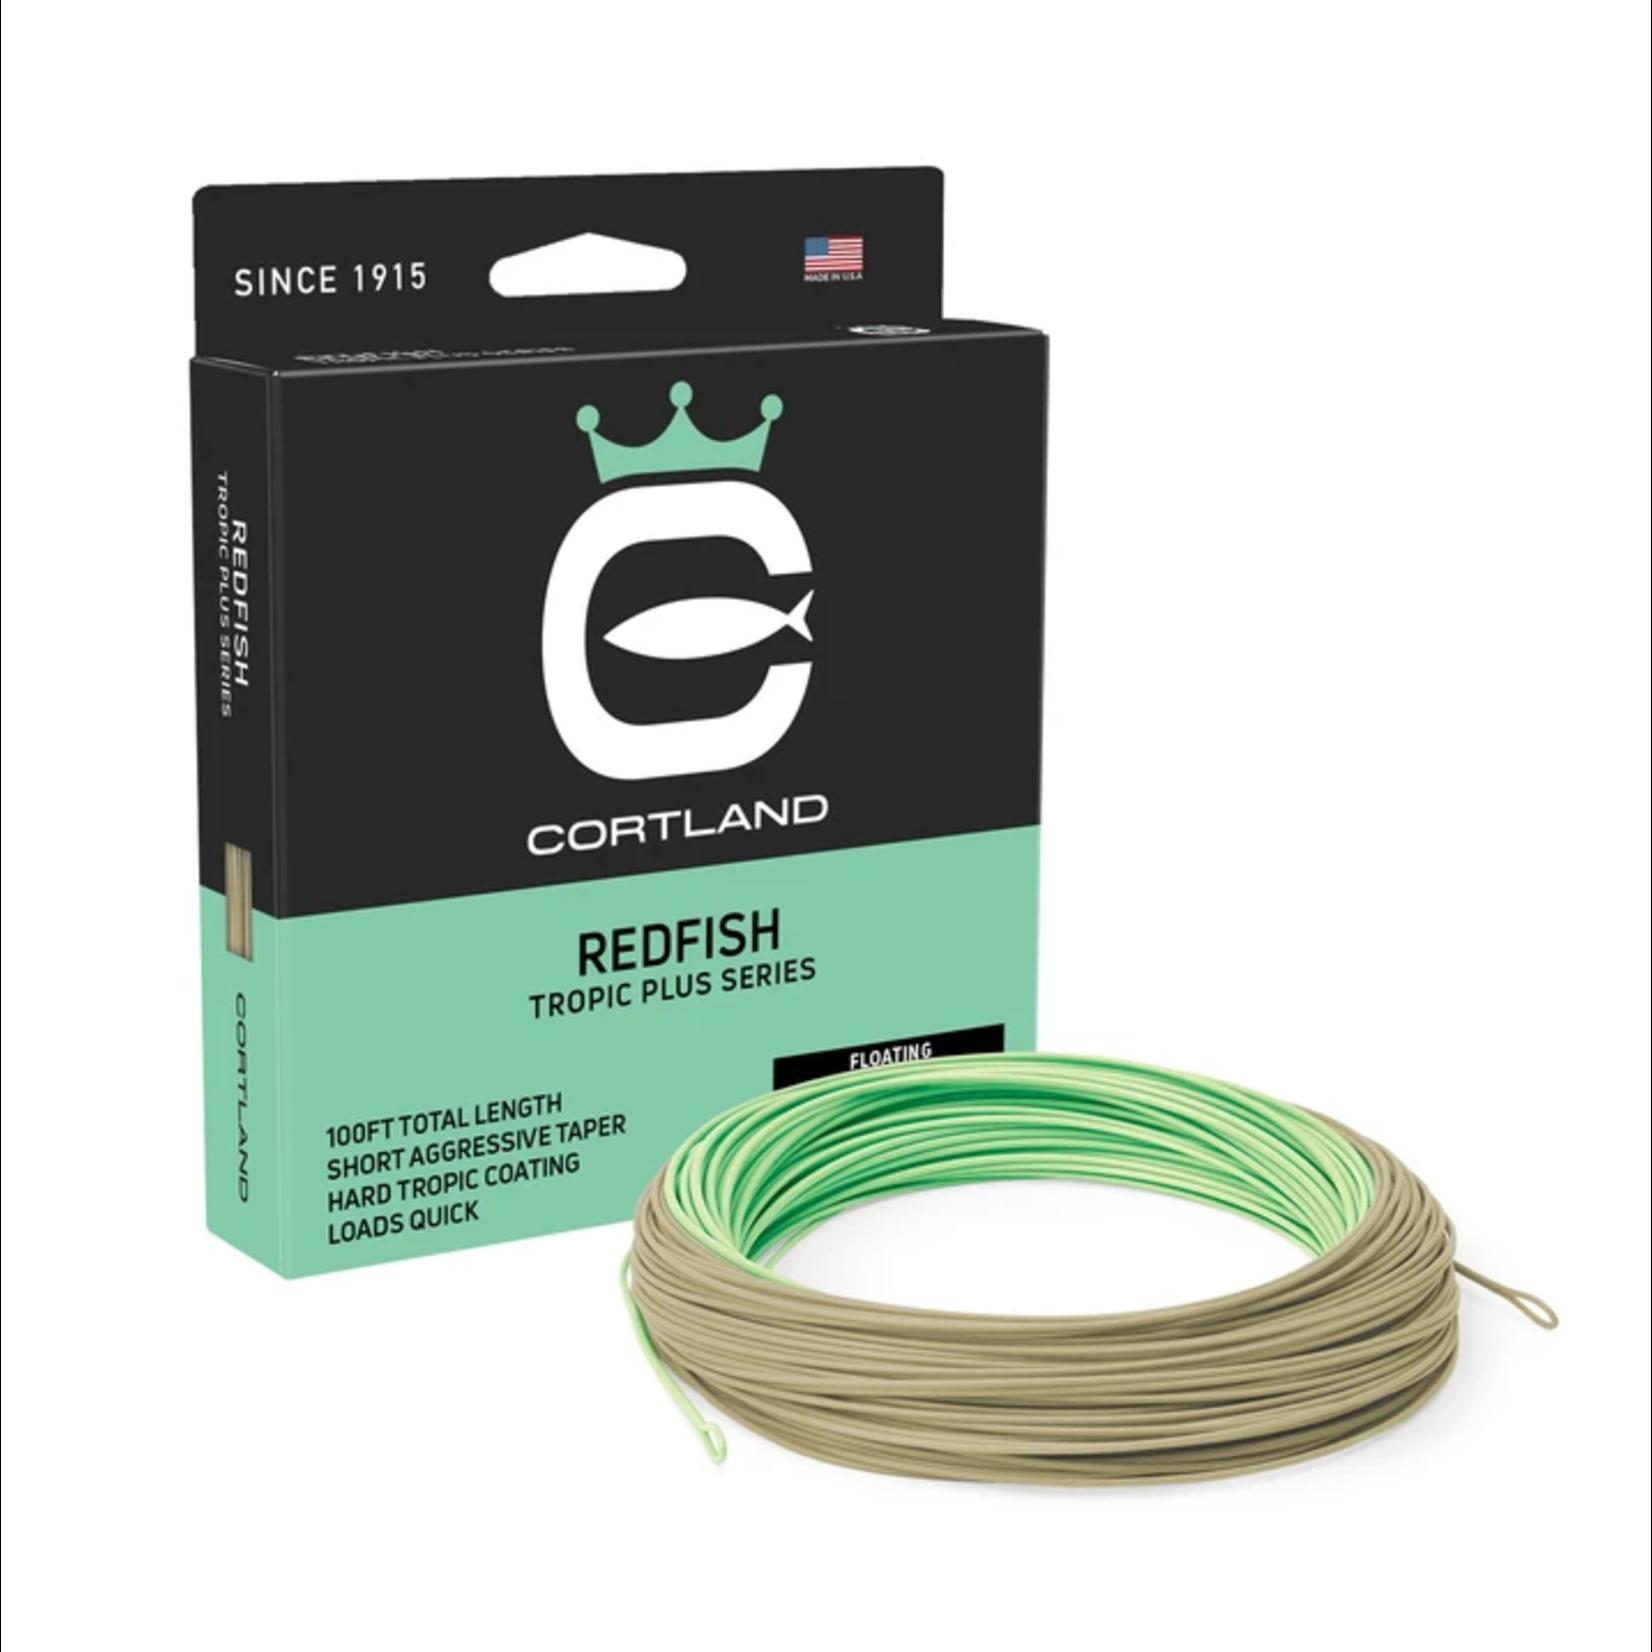 Cortland | Tropic Plus Series Redfish 10wt